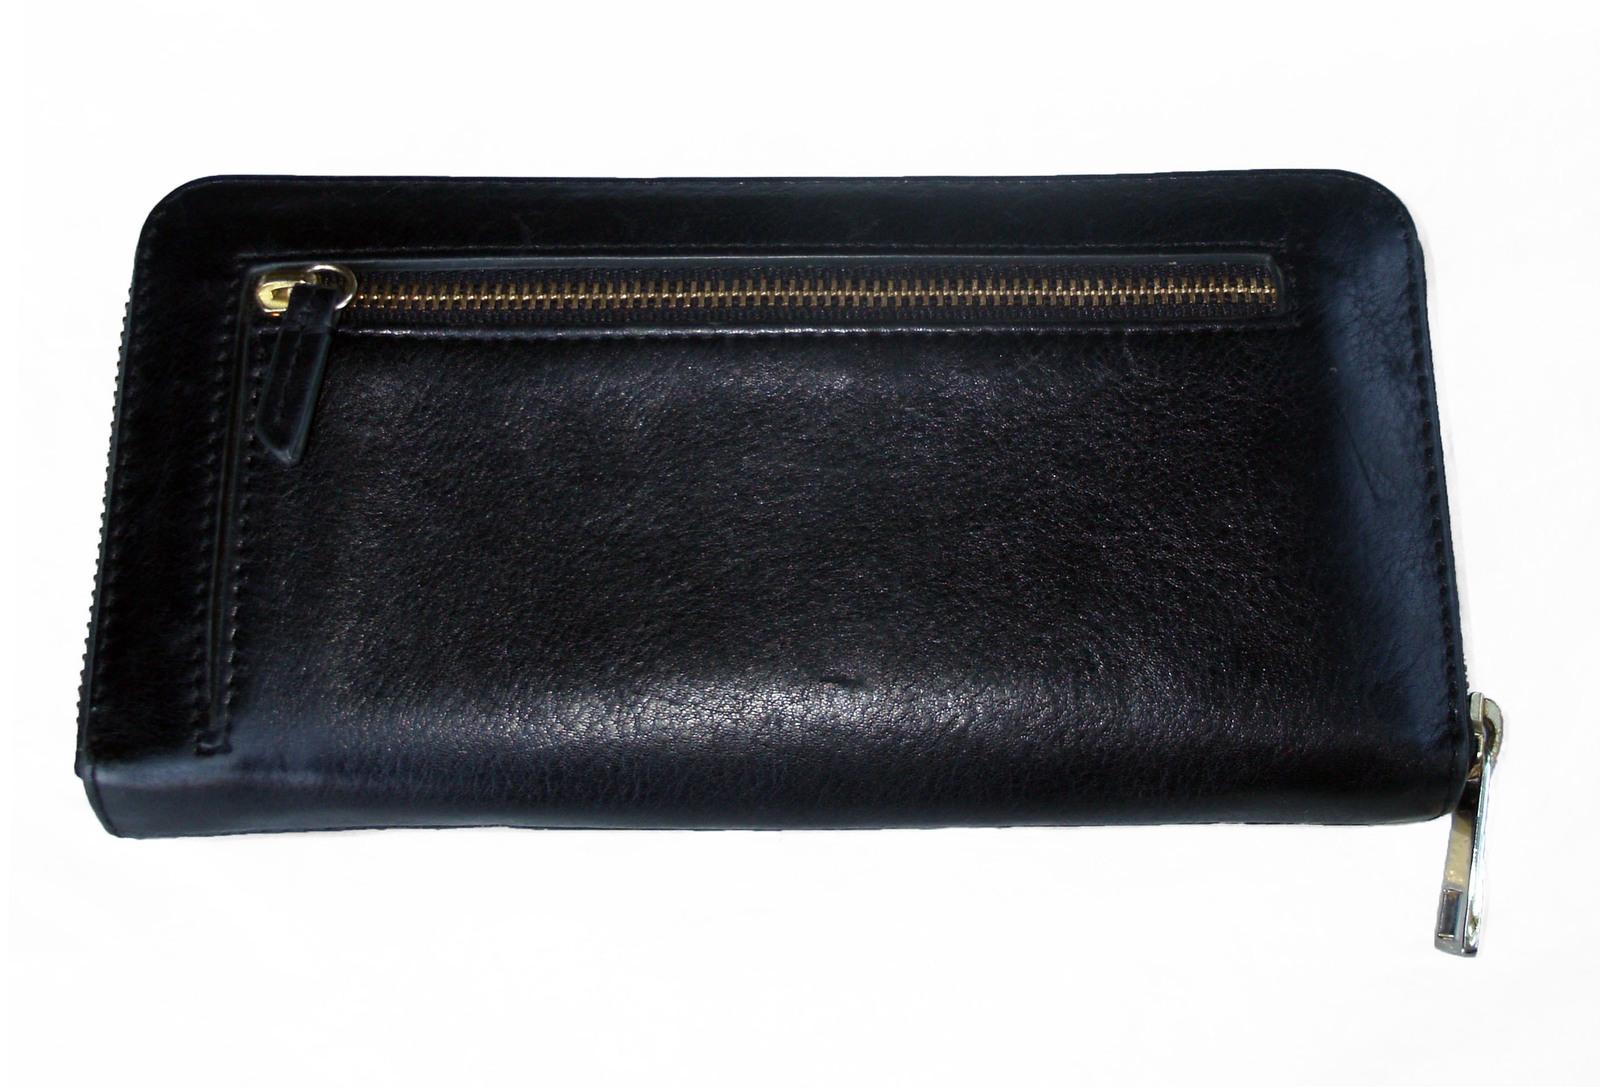 Fossil Leather Clutch Wallet Black Ziparound Accordion Organizer